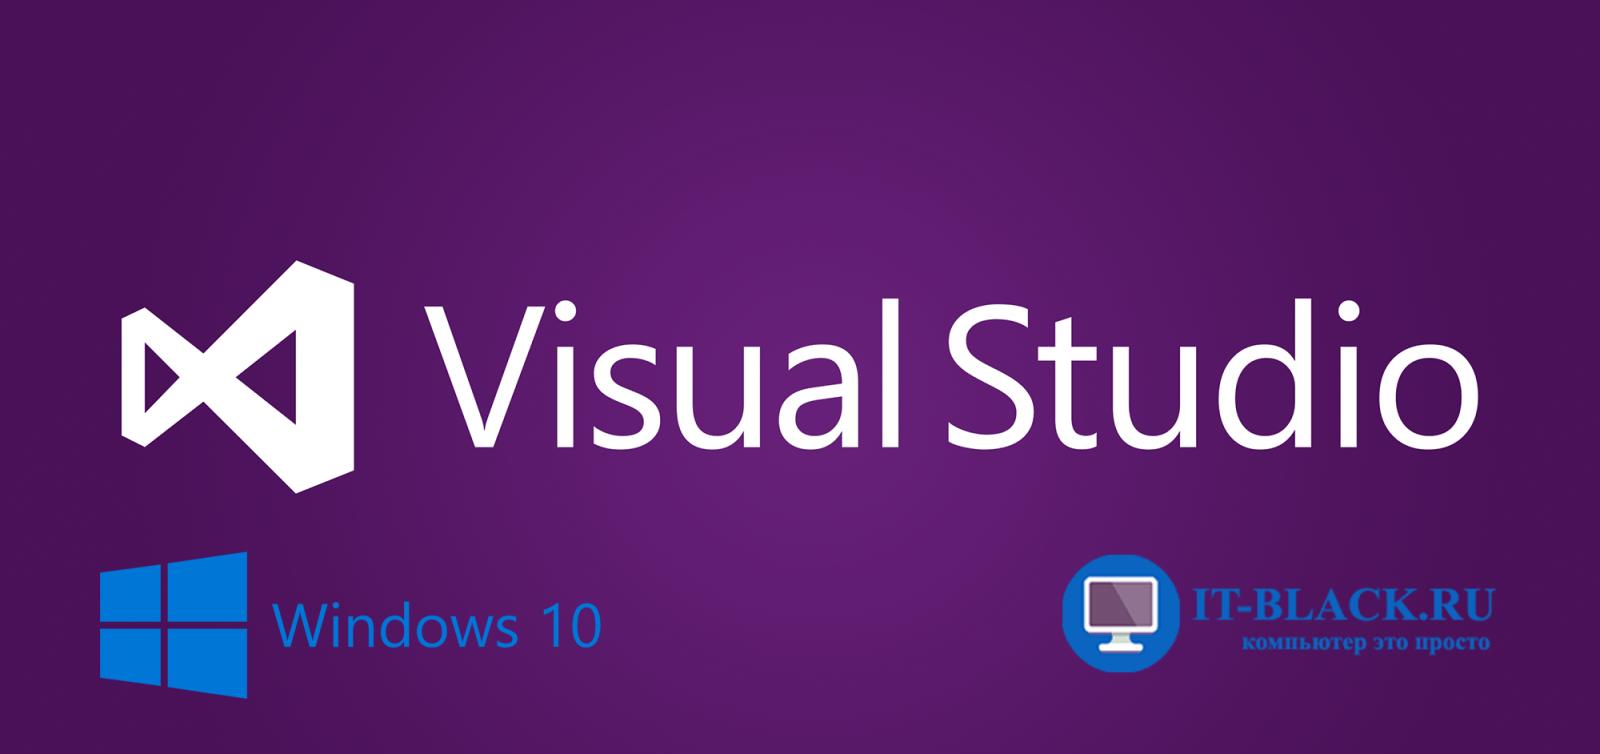 Установка Visual Studio 2019 на Windows 10.